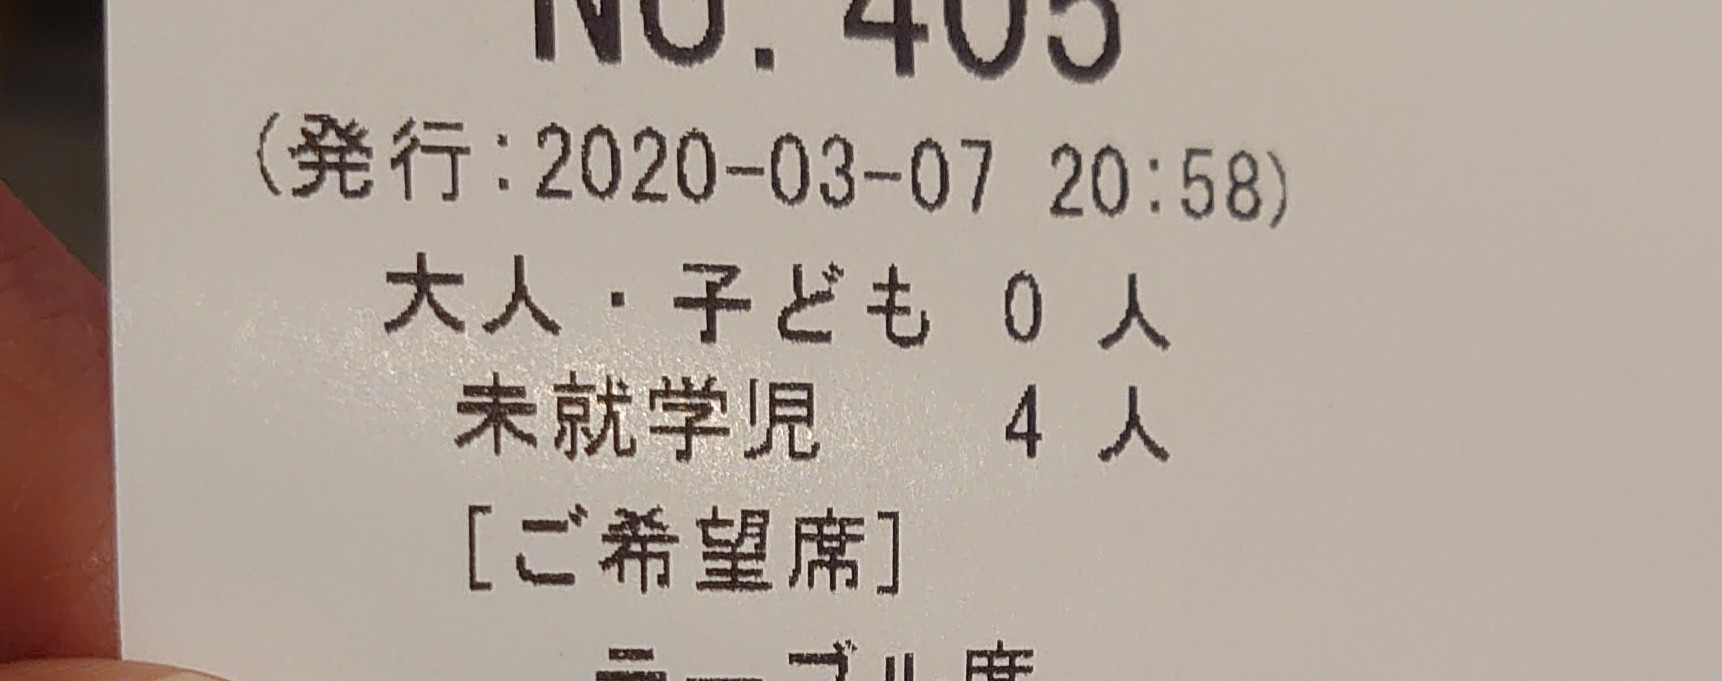 20200308125402e52.jpg